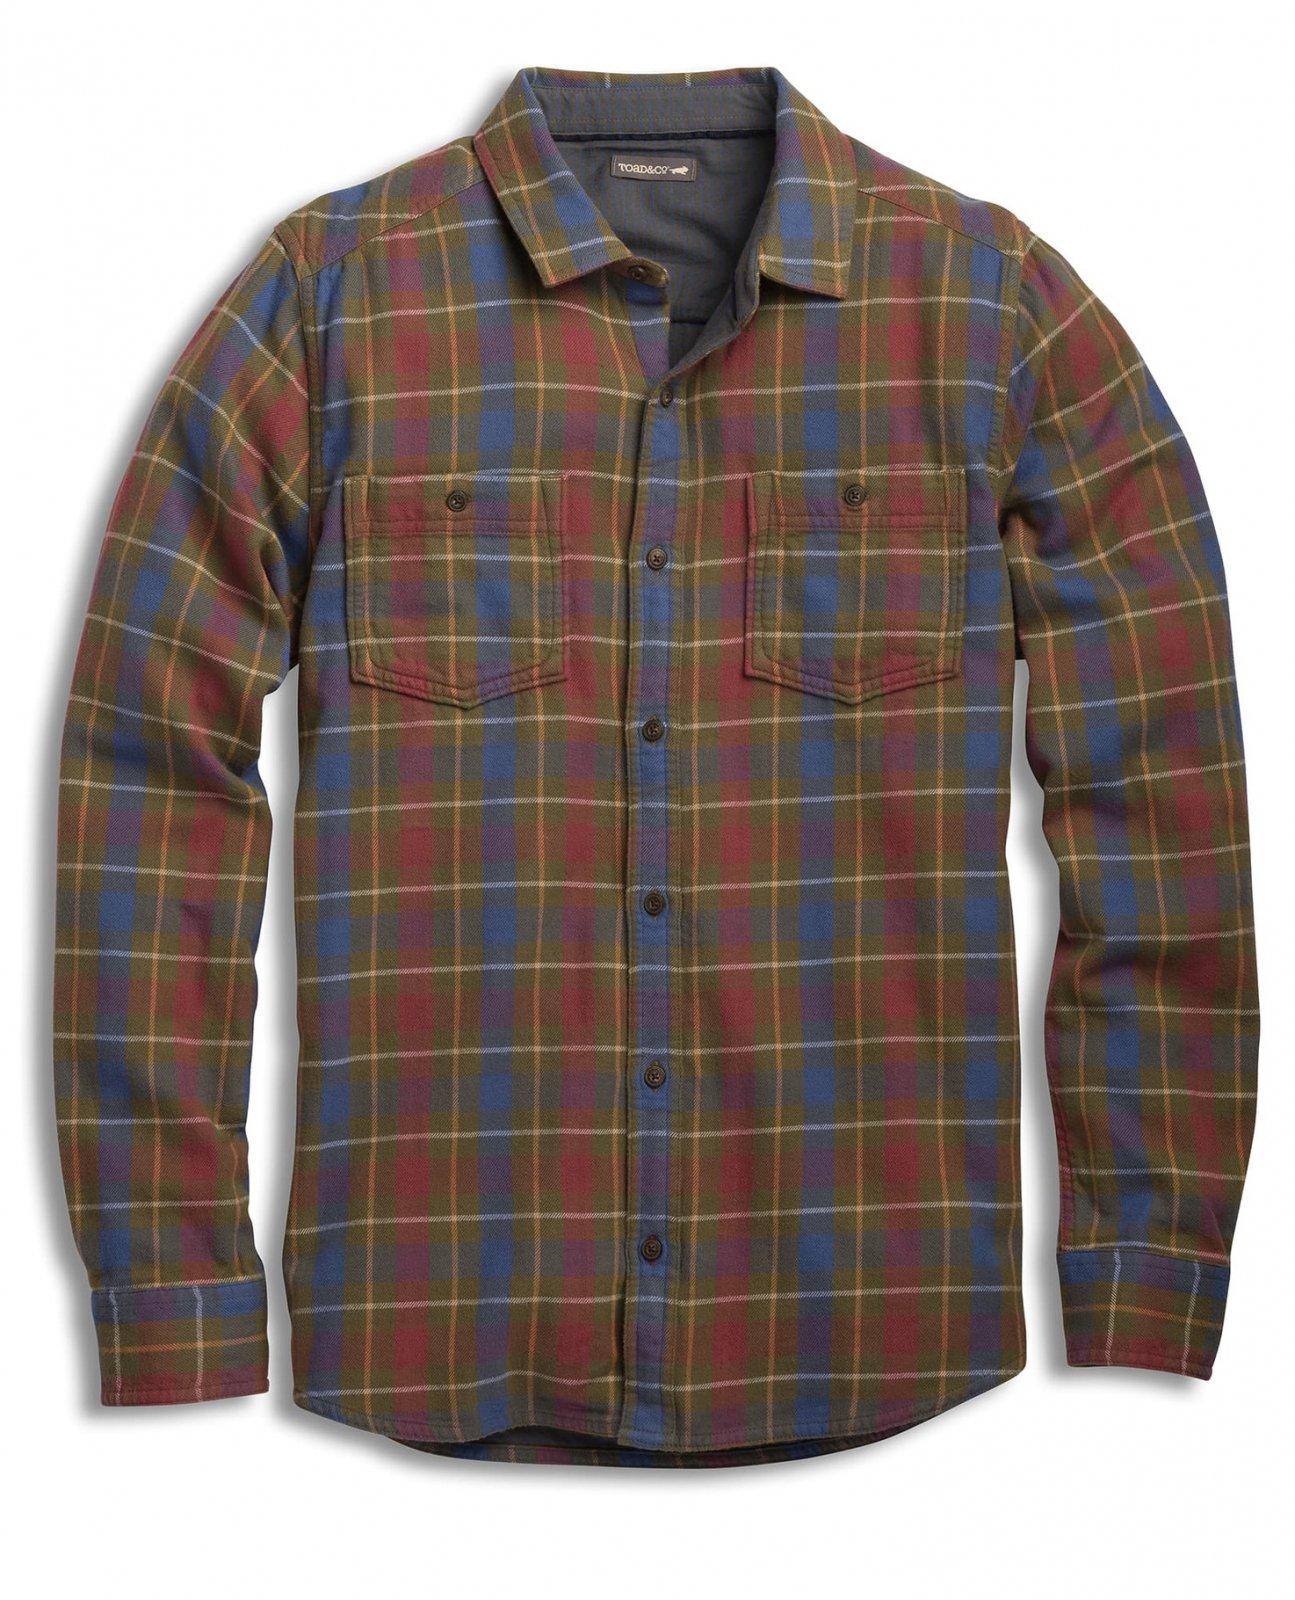 89b3a3a2a Casual Shirts & Tops